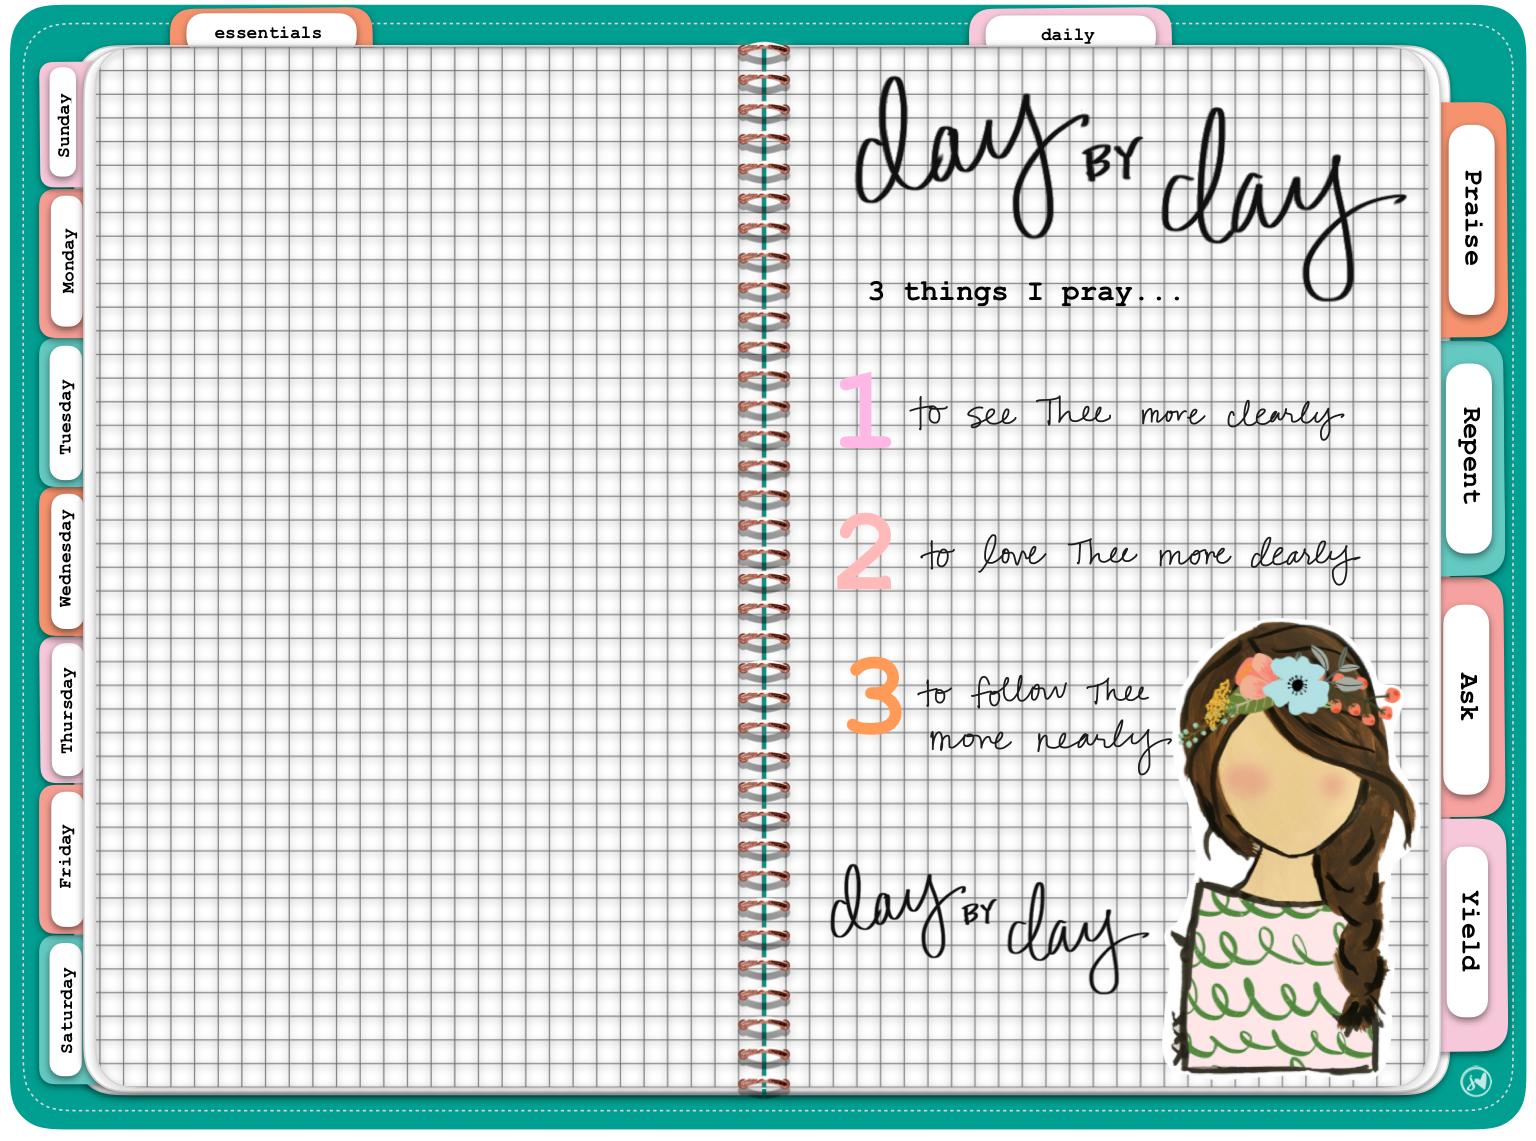 daybyday_jenuineruby prayer binder.jpg